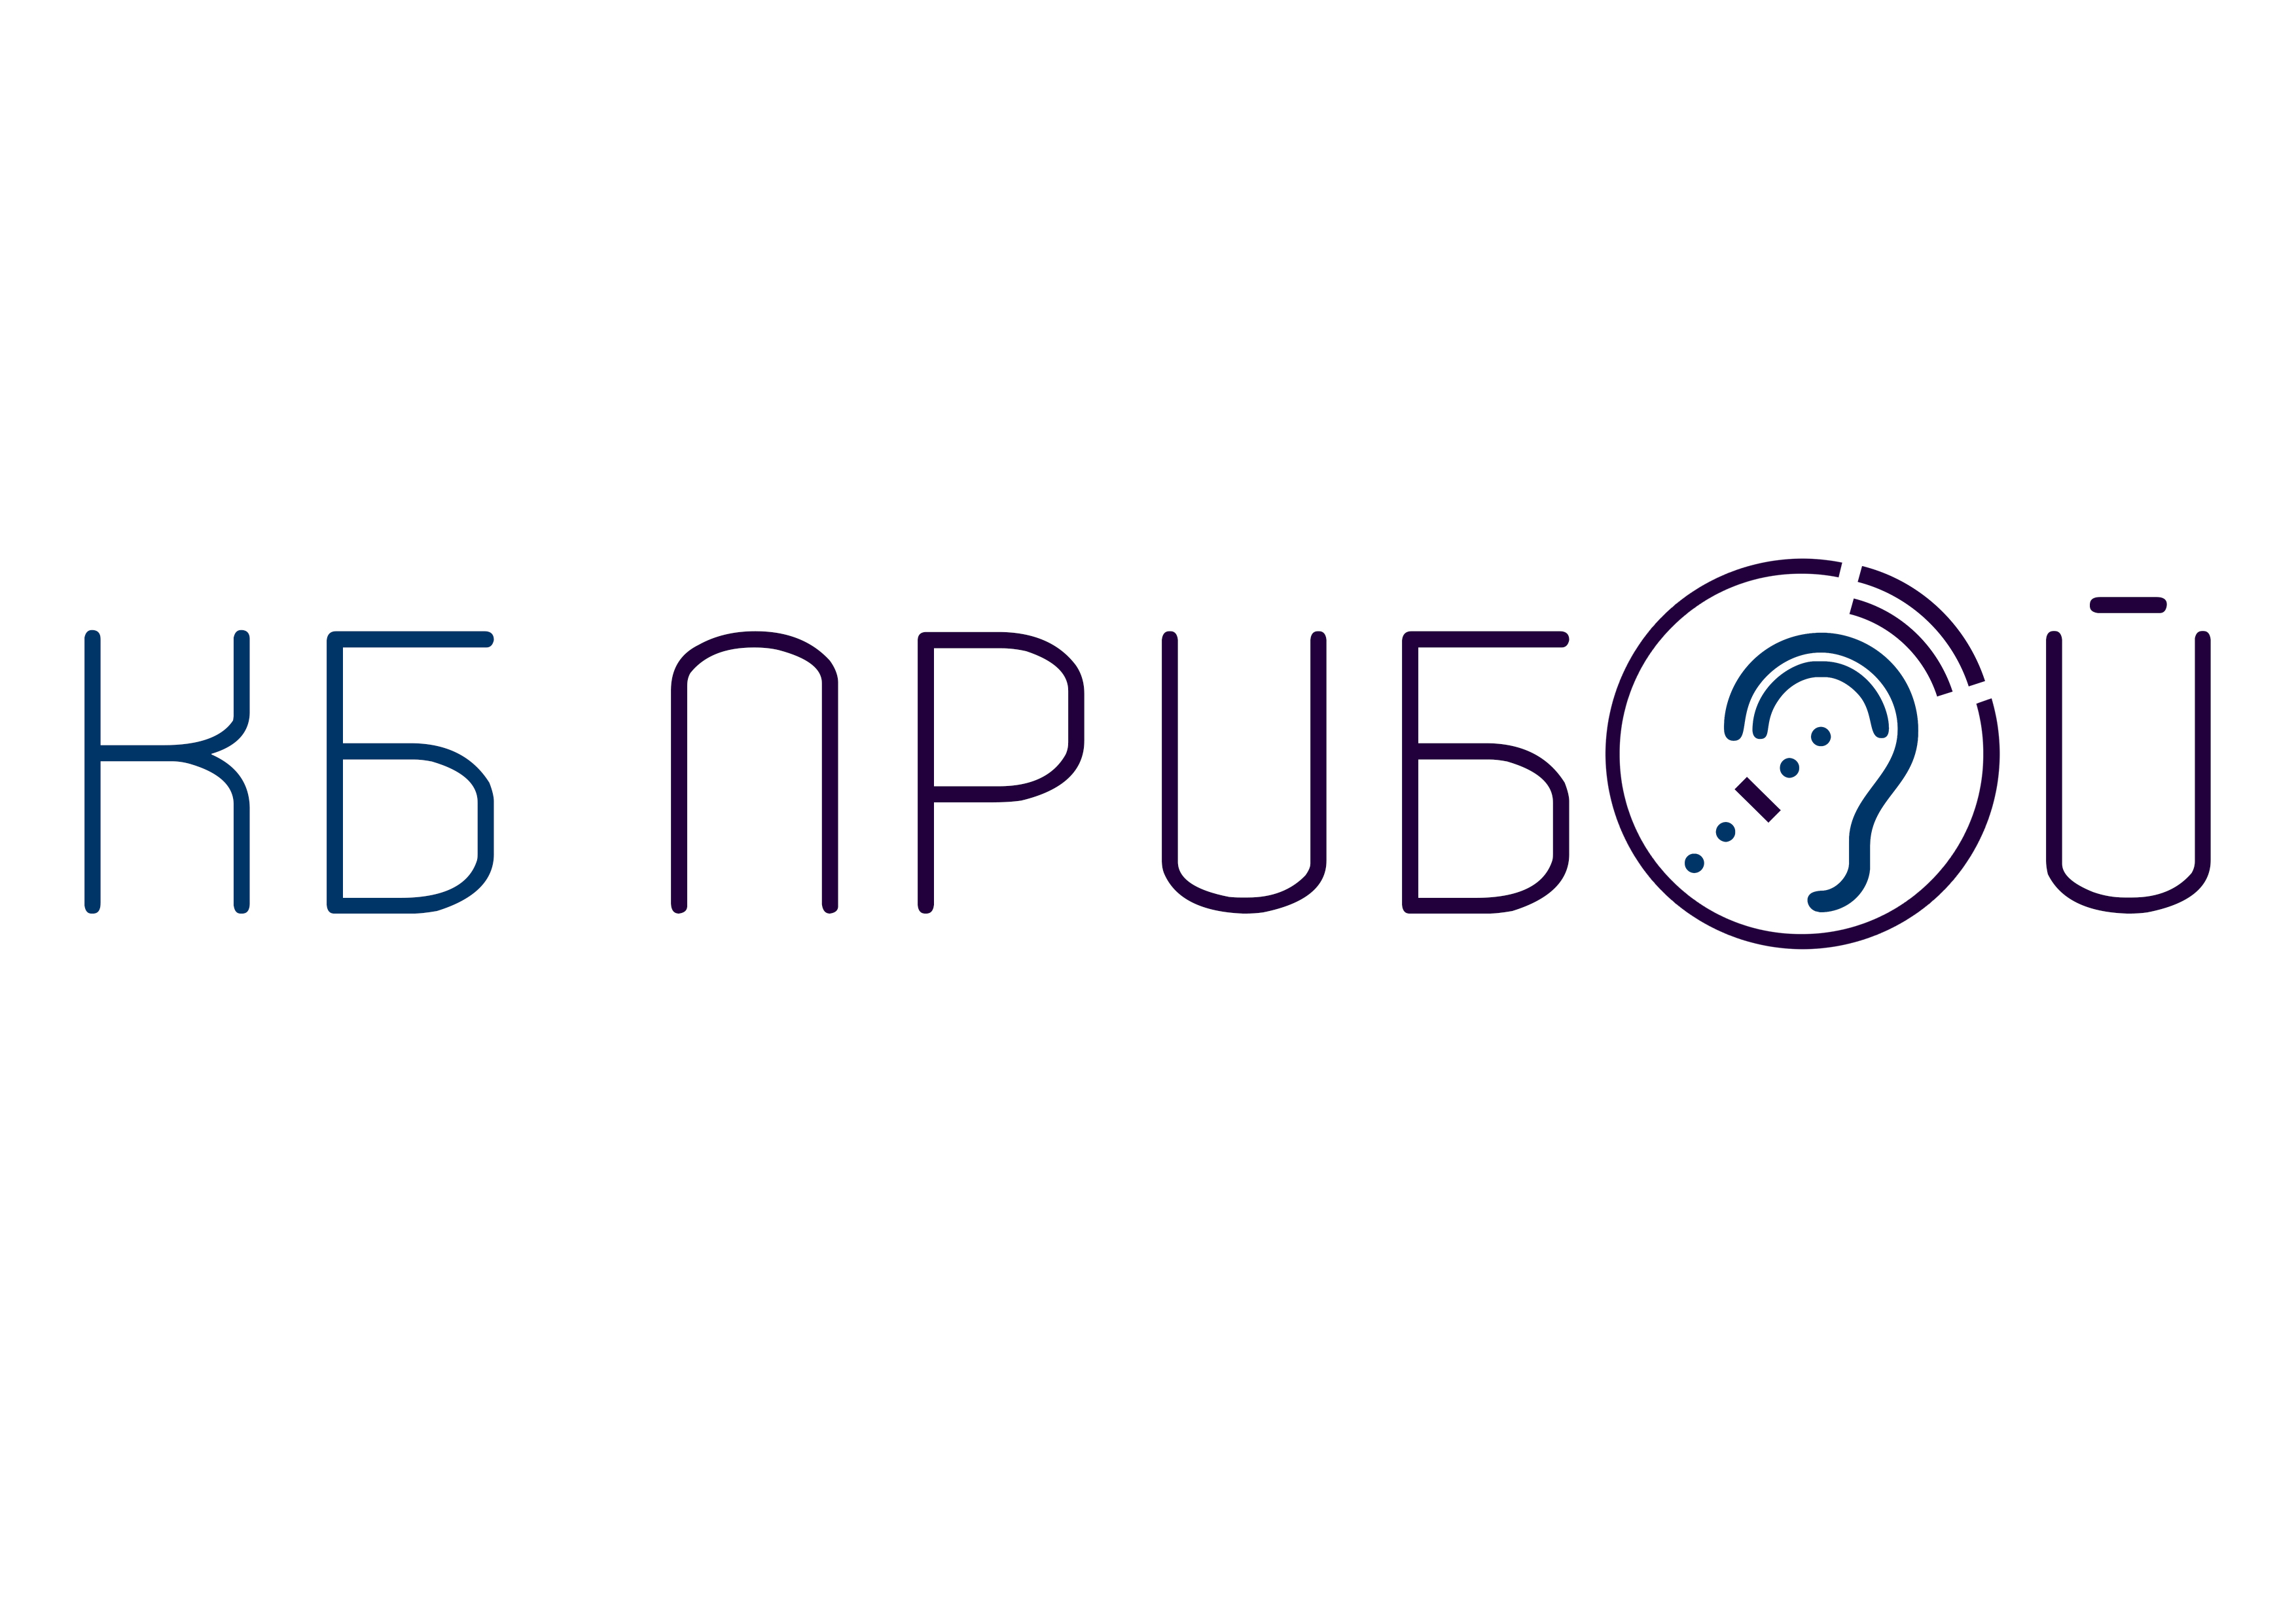 Разработка логотипа и фирменного стиля для КБ Прибой фото f_5465b278a66183d3.jpg